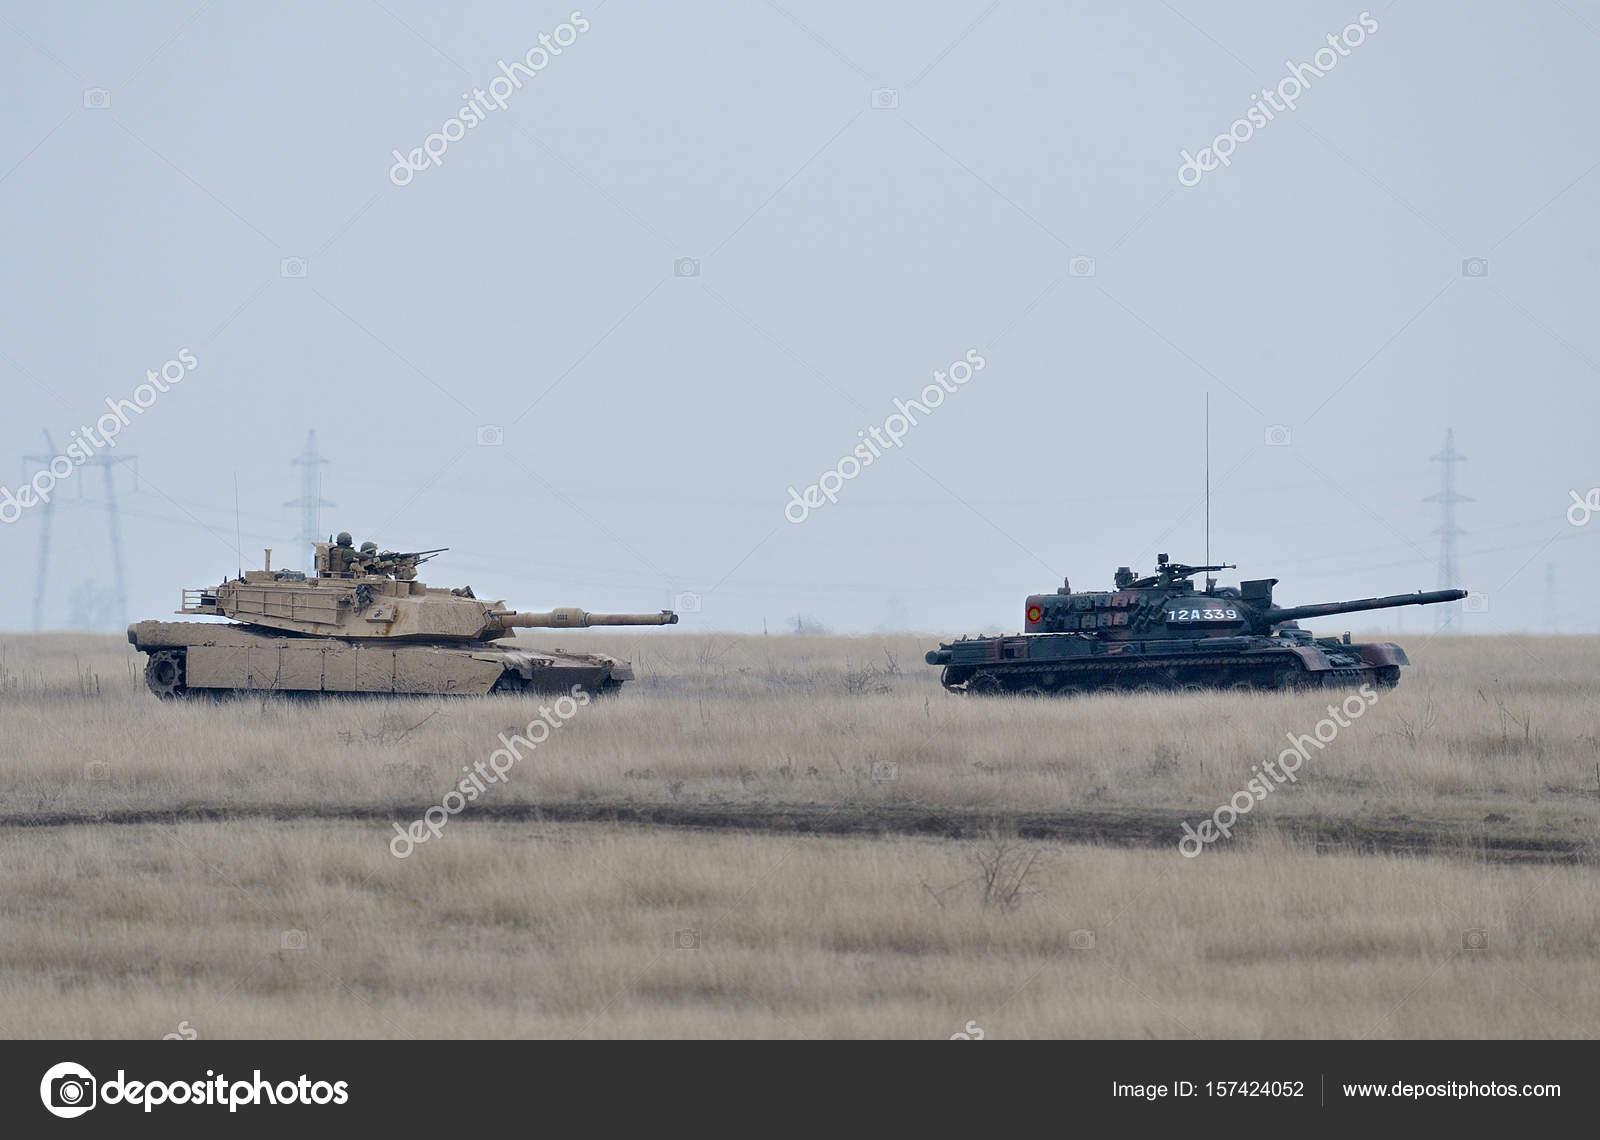 GALATI, ROMANIA - DECEMBER 11: Romanian tank TR-85M1 and US Abra